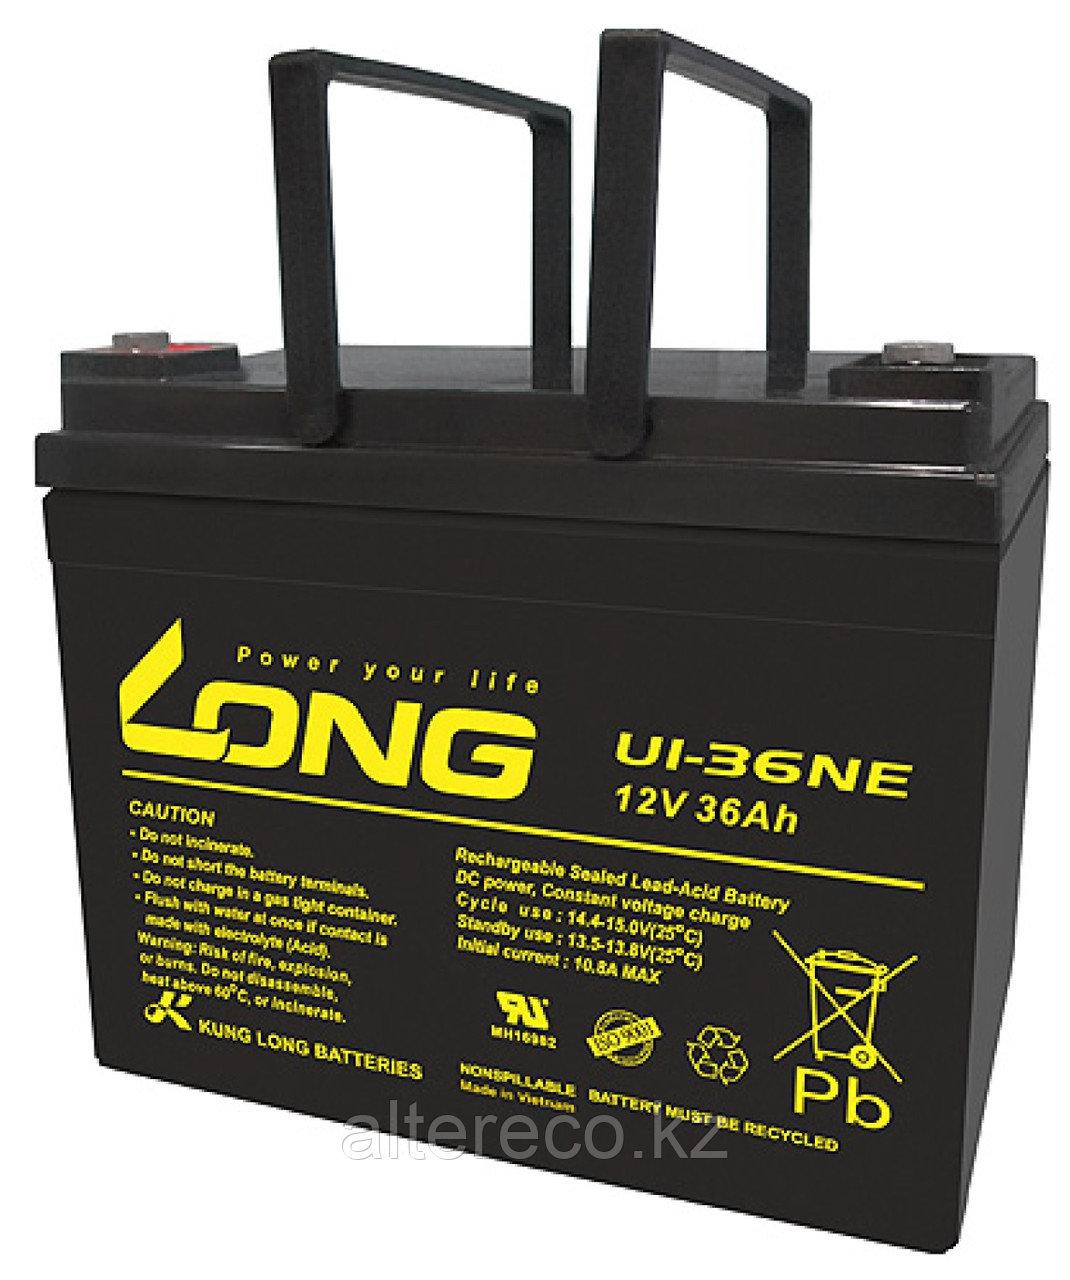 Аккумулятор LONG U1-36NE (12В, 36Ач)